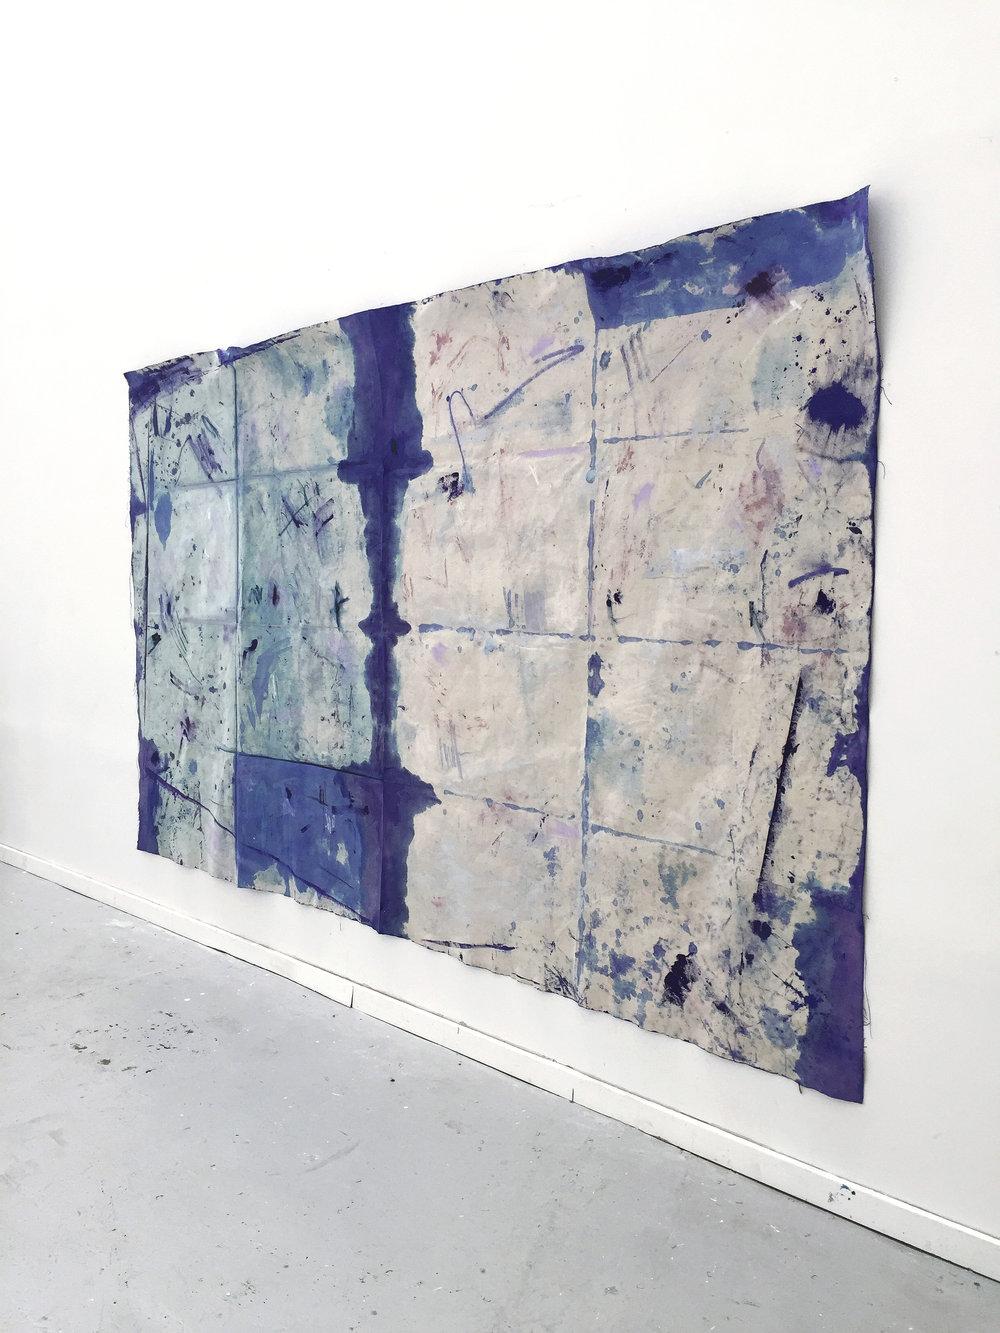 Tess WIlliams - 'Border Lines' -Oil, Ink & Bleach on Canvas - 180x296.jpg